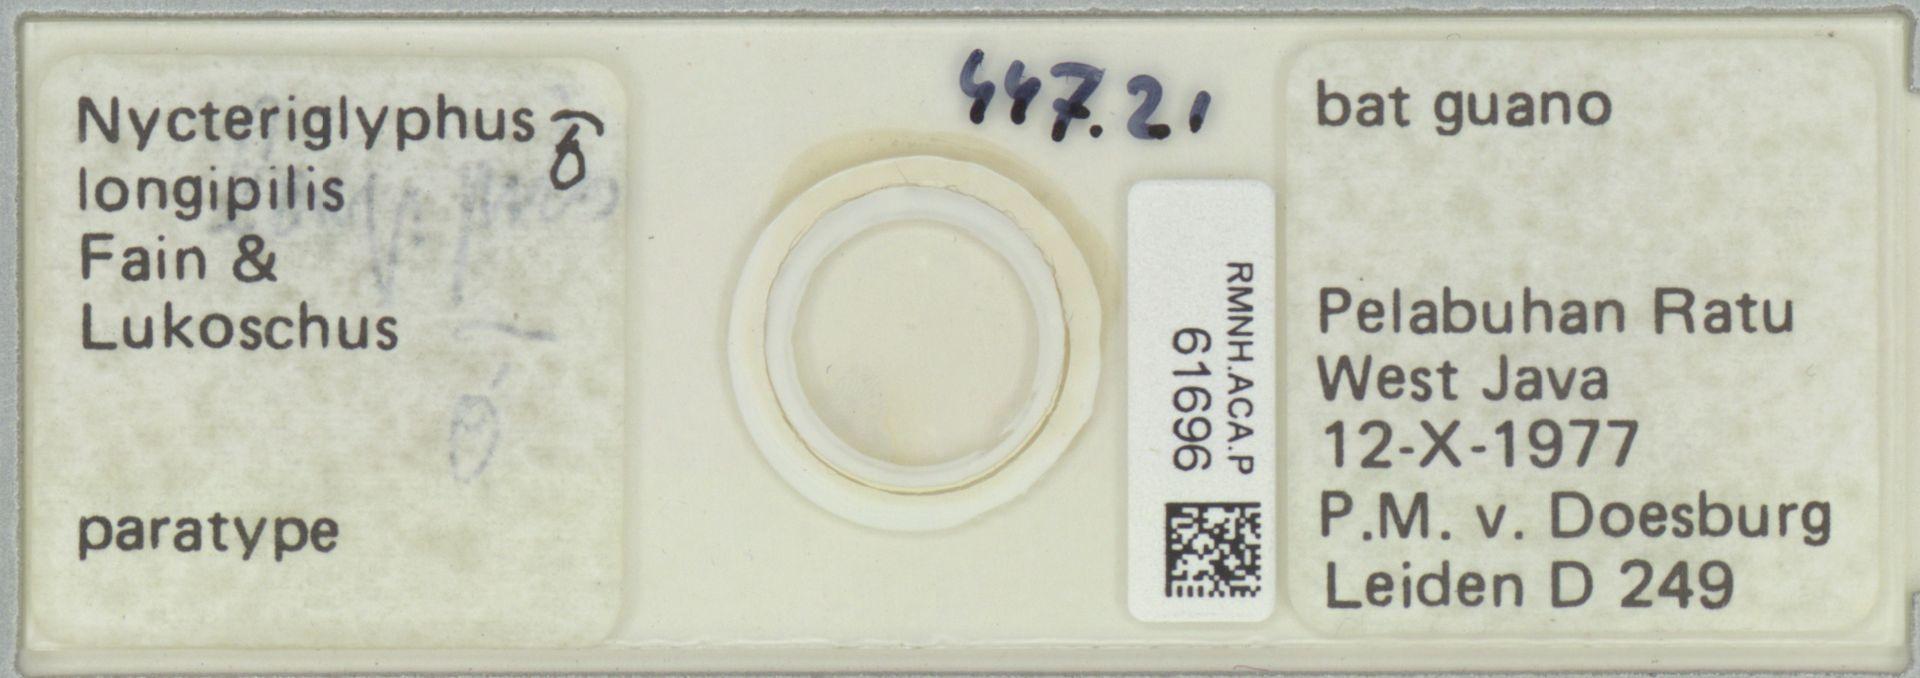 RMNH.ACA.P.61696 | Nycteriglyphus longipilis Fain & Lukoschus